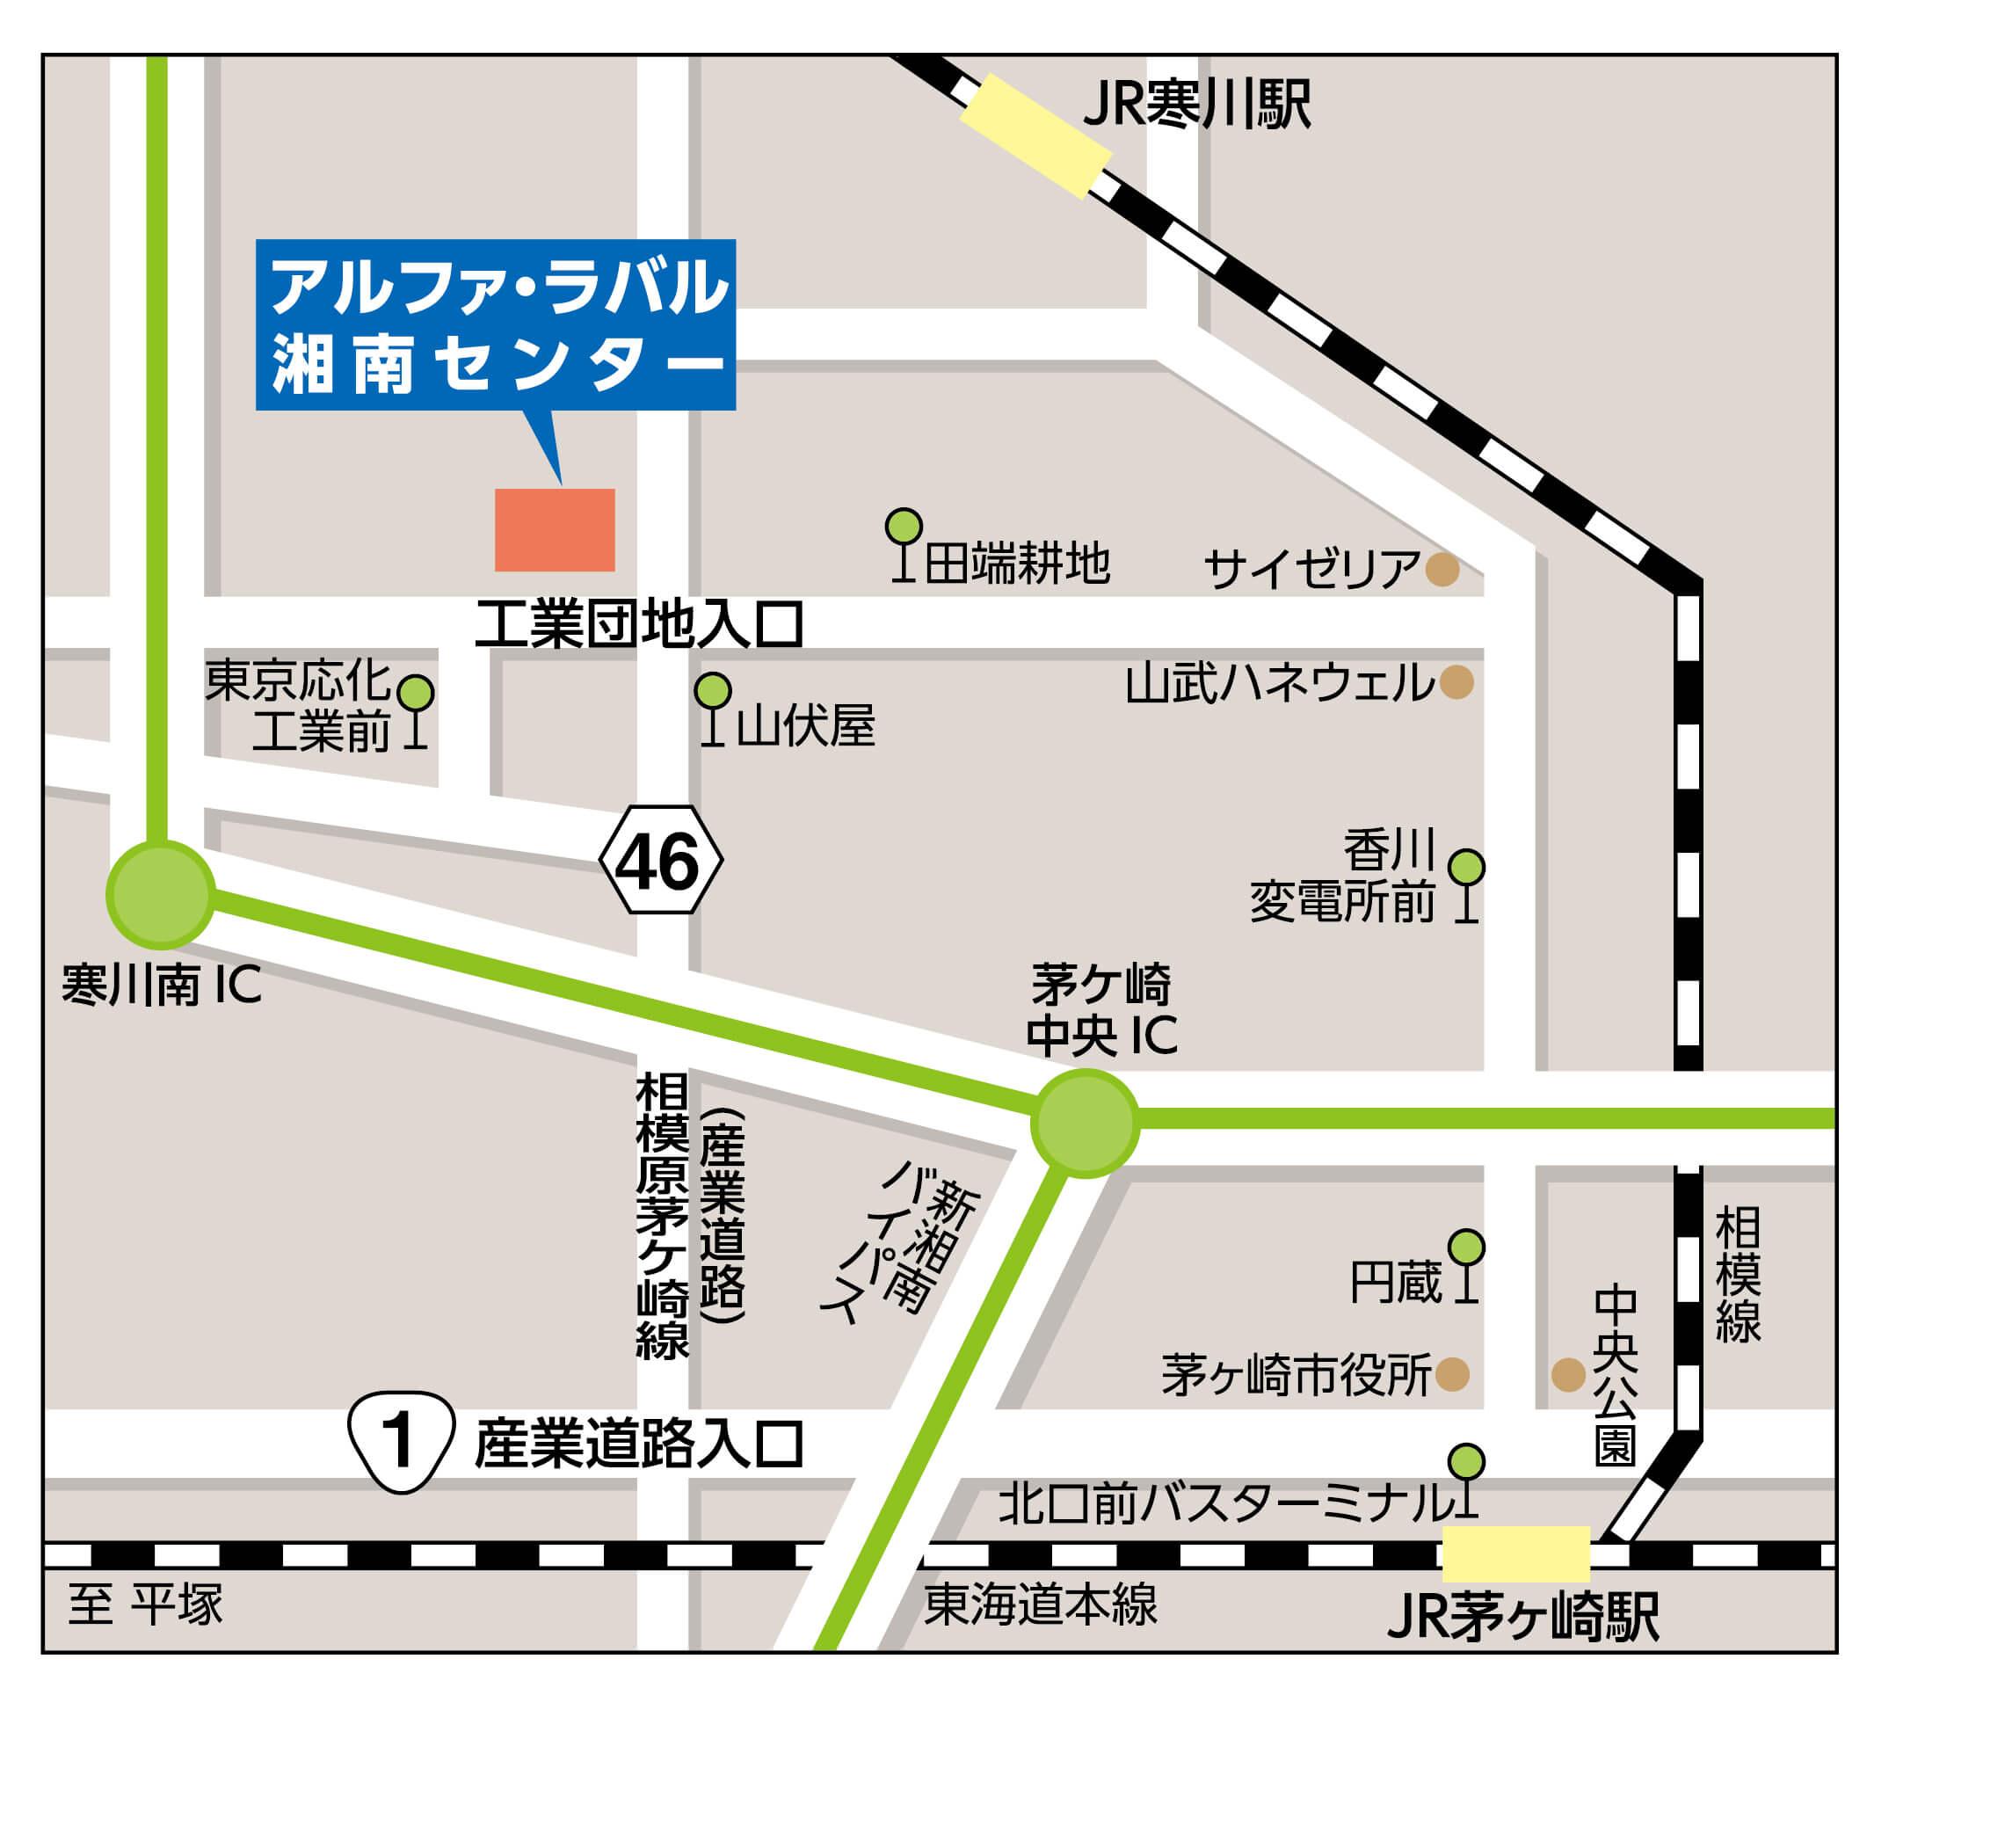 ShonanFactory Map